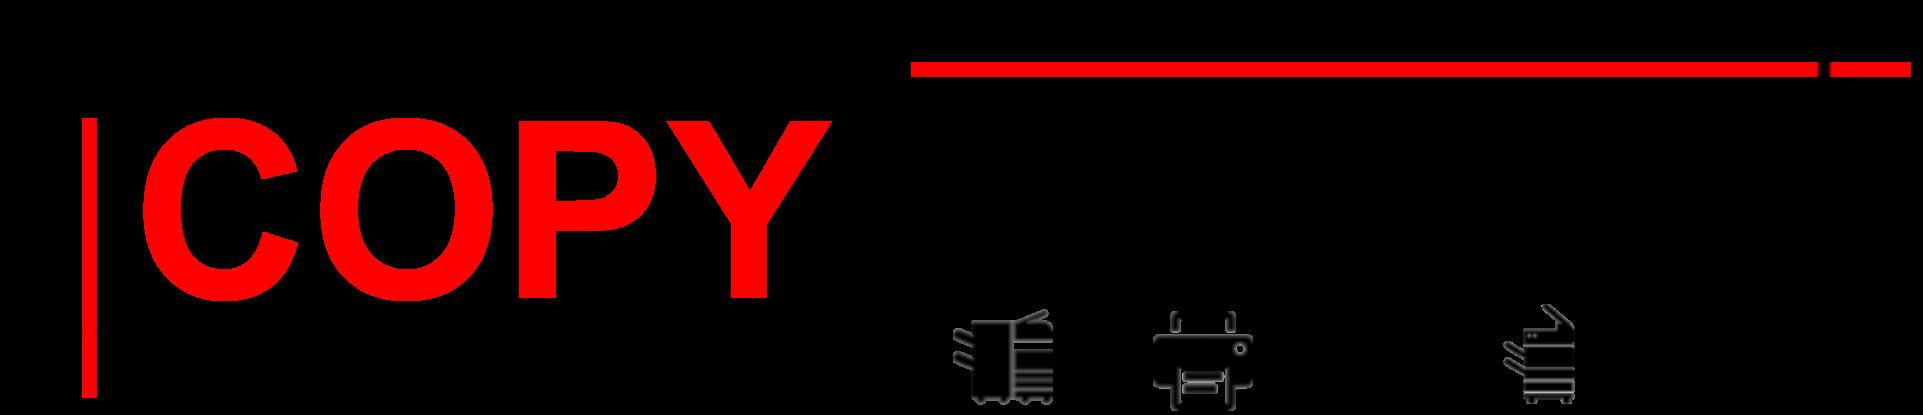 Copy-servis